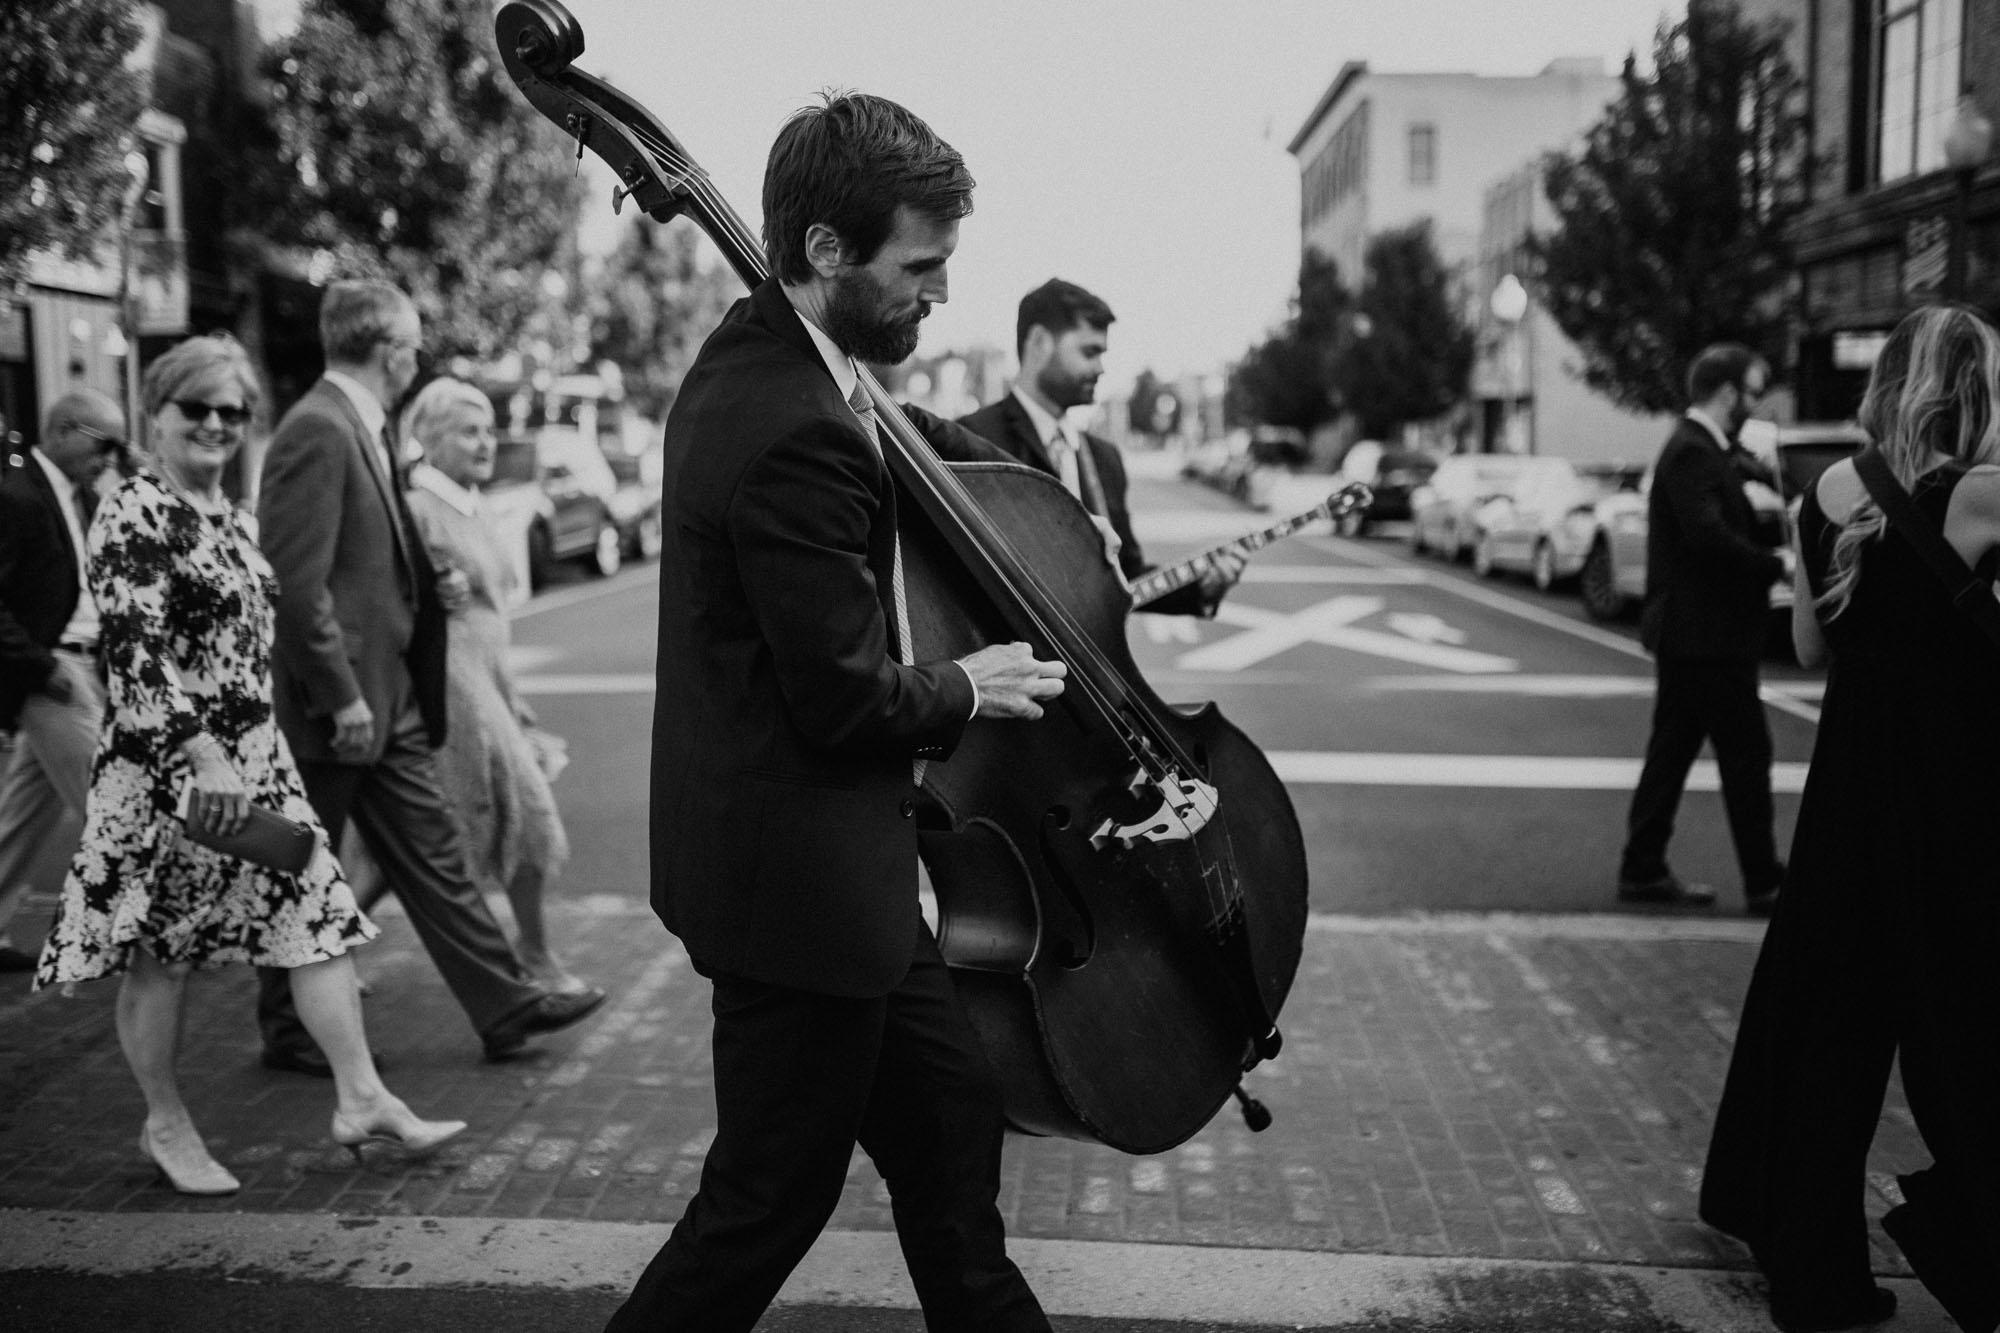 journeyman_distillery_wedding_photographer_chicago_il_wright_photographs-3981.jpg